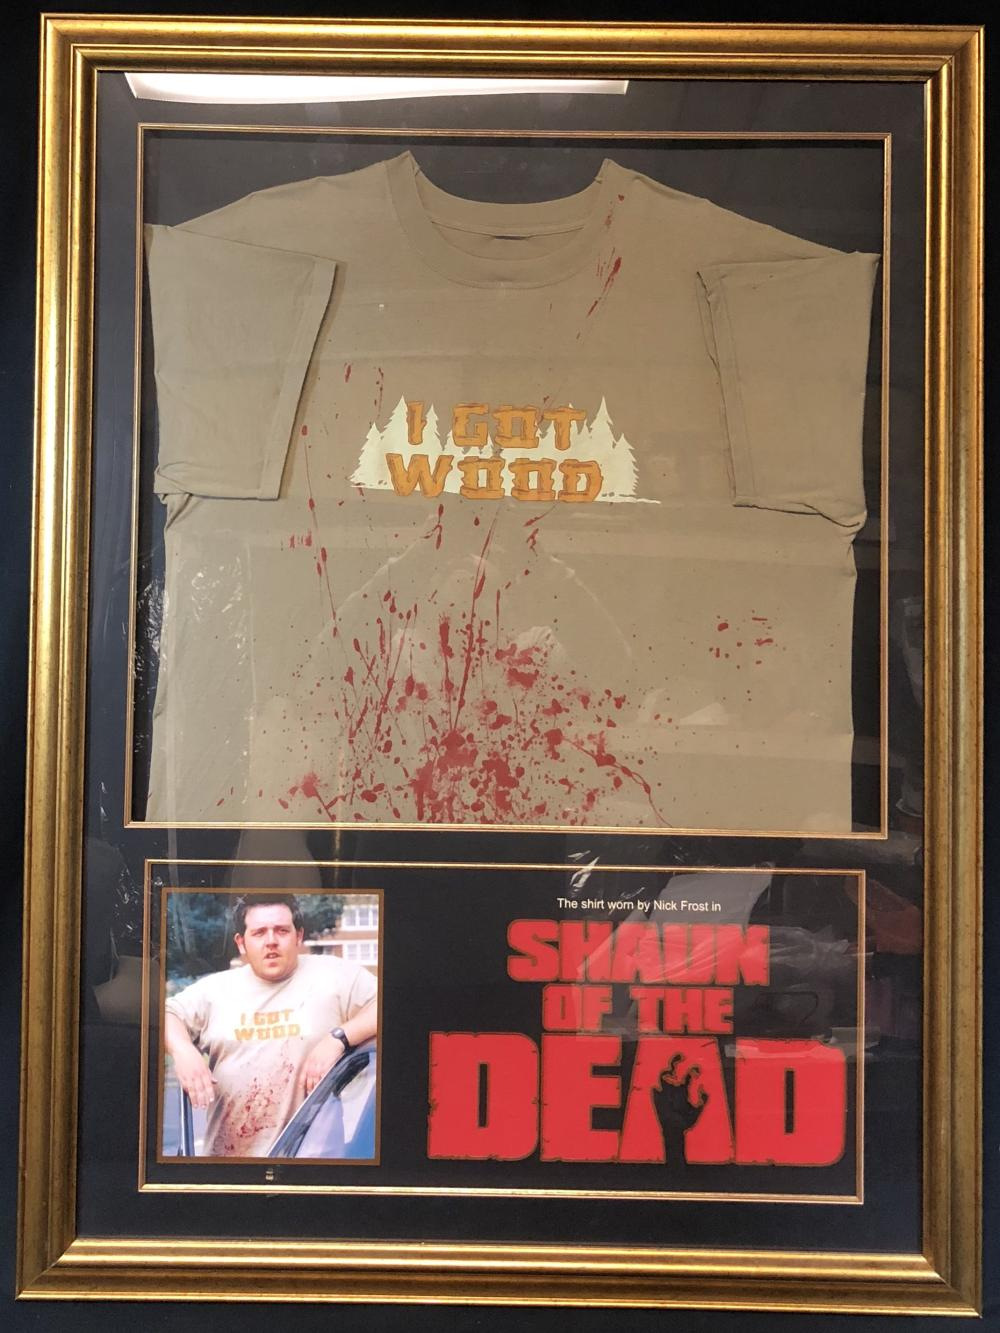 "Shaun of the Dead (2004) - Ed (Nick Frost) ""I Got Wood"" Shirt"